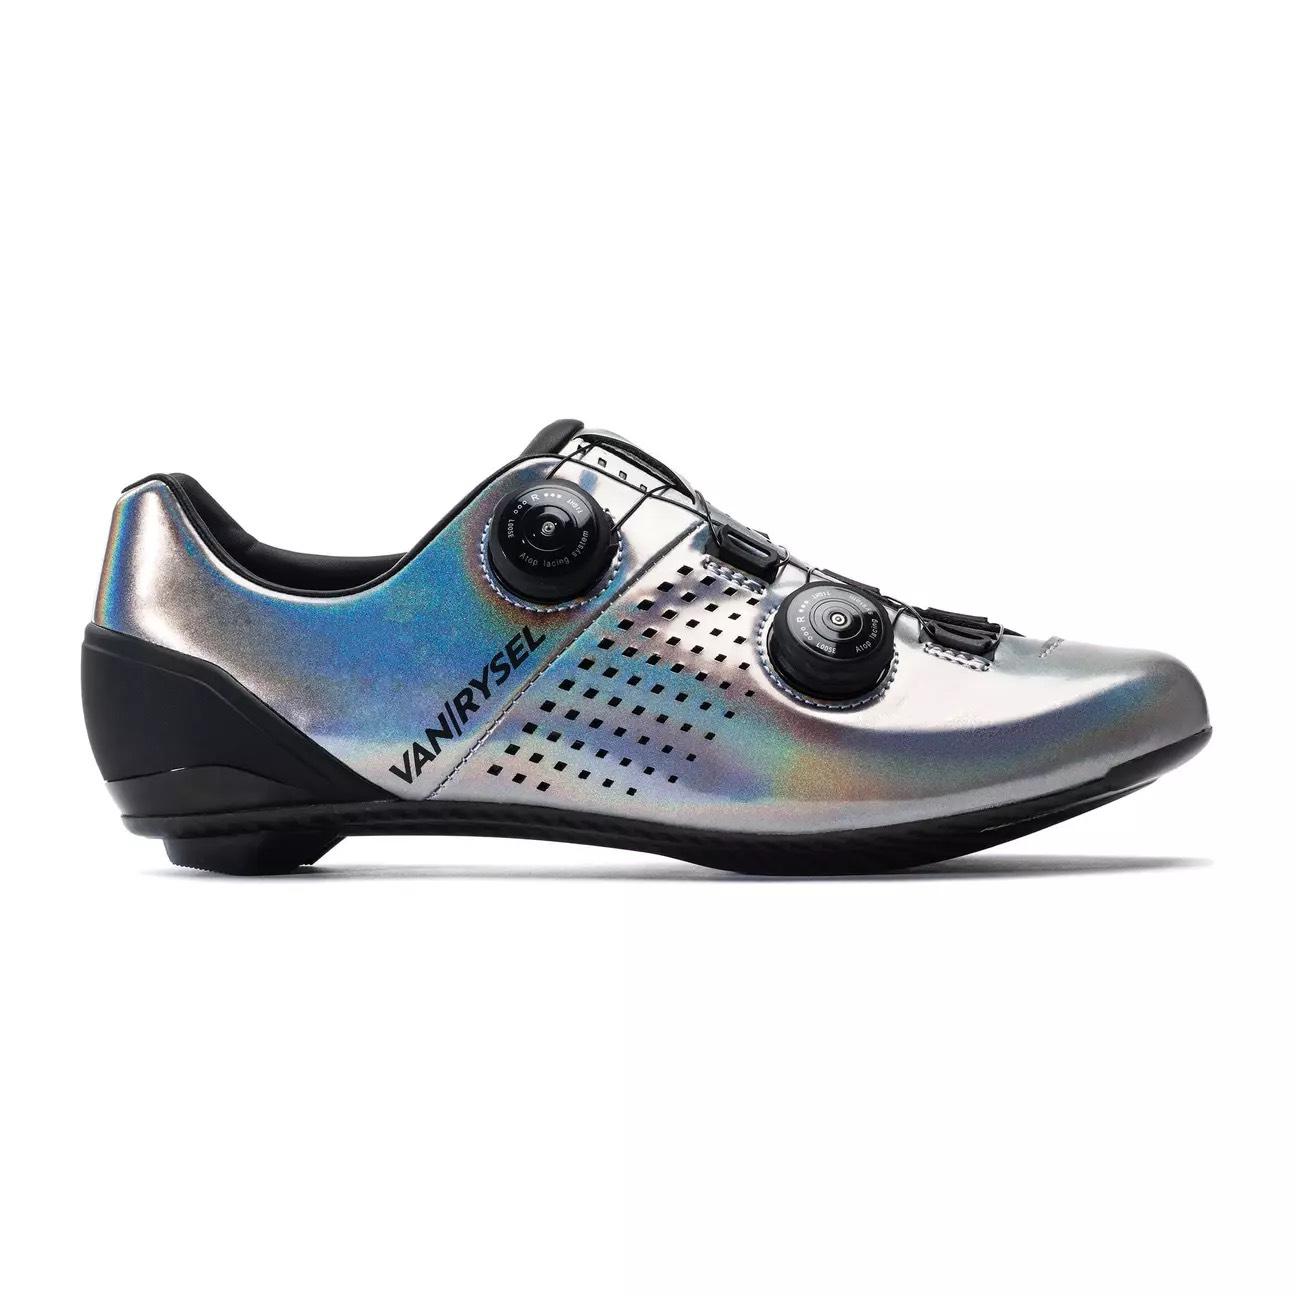 Chaussures vélo carbone Van Rysel - Gris clair